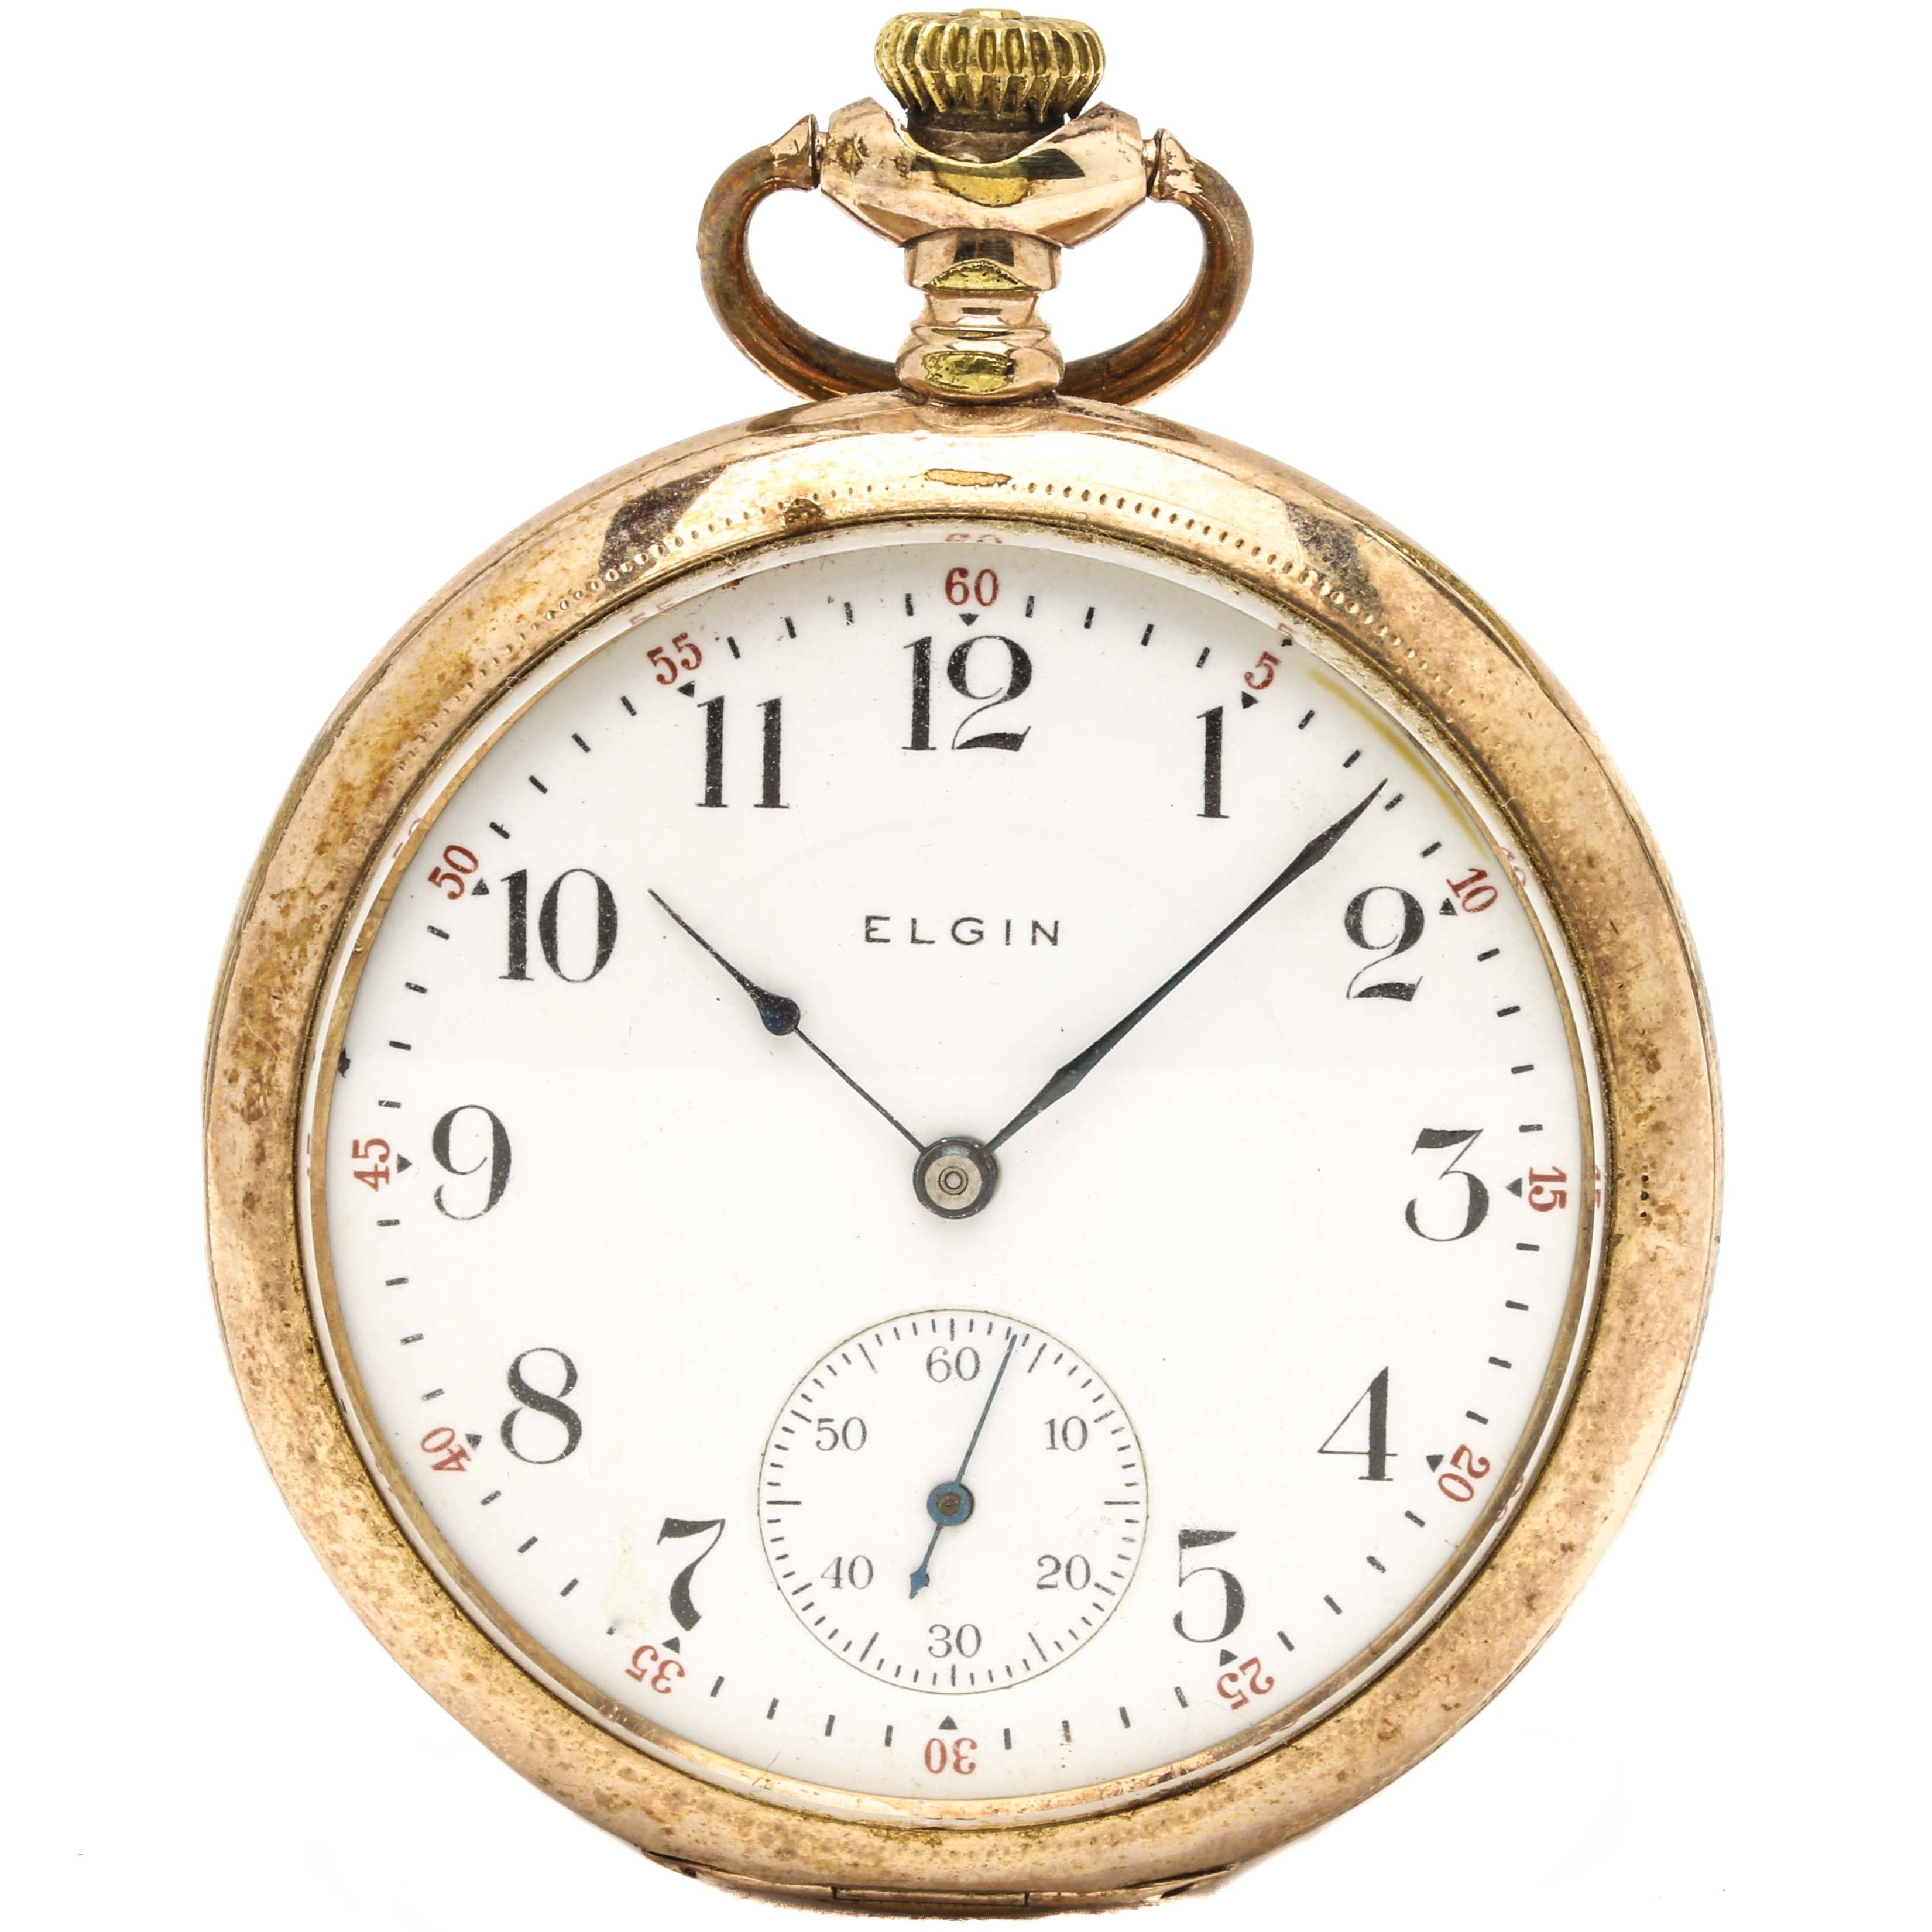 Circa 1912 Elgin :Pocket Watch